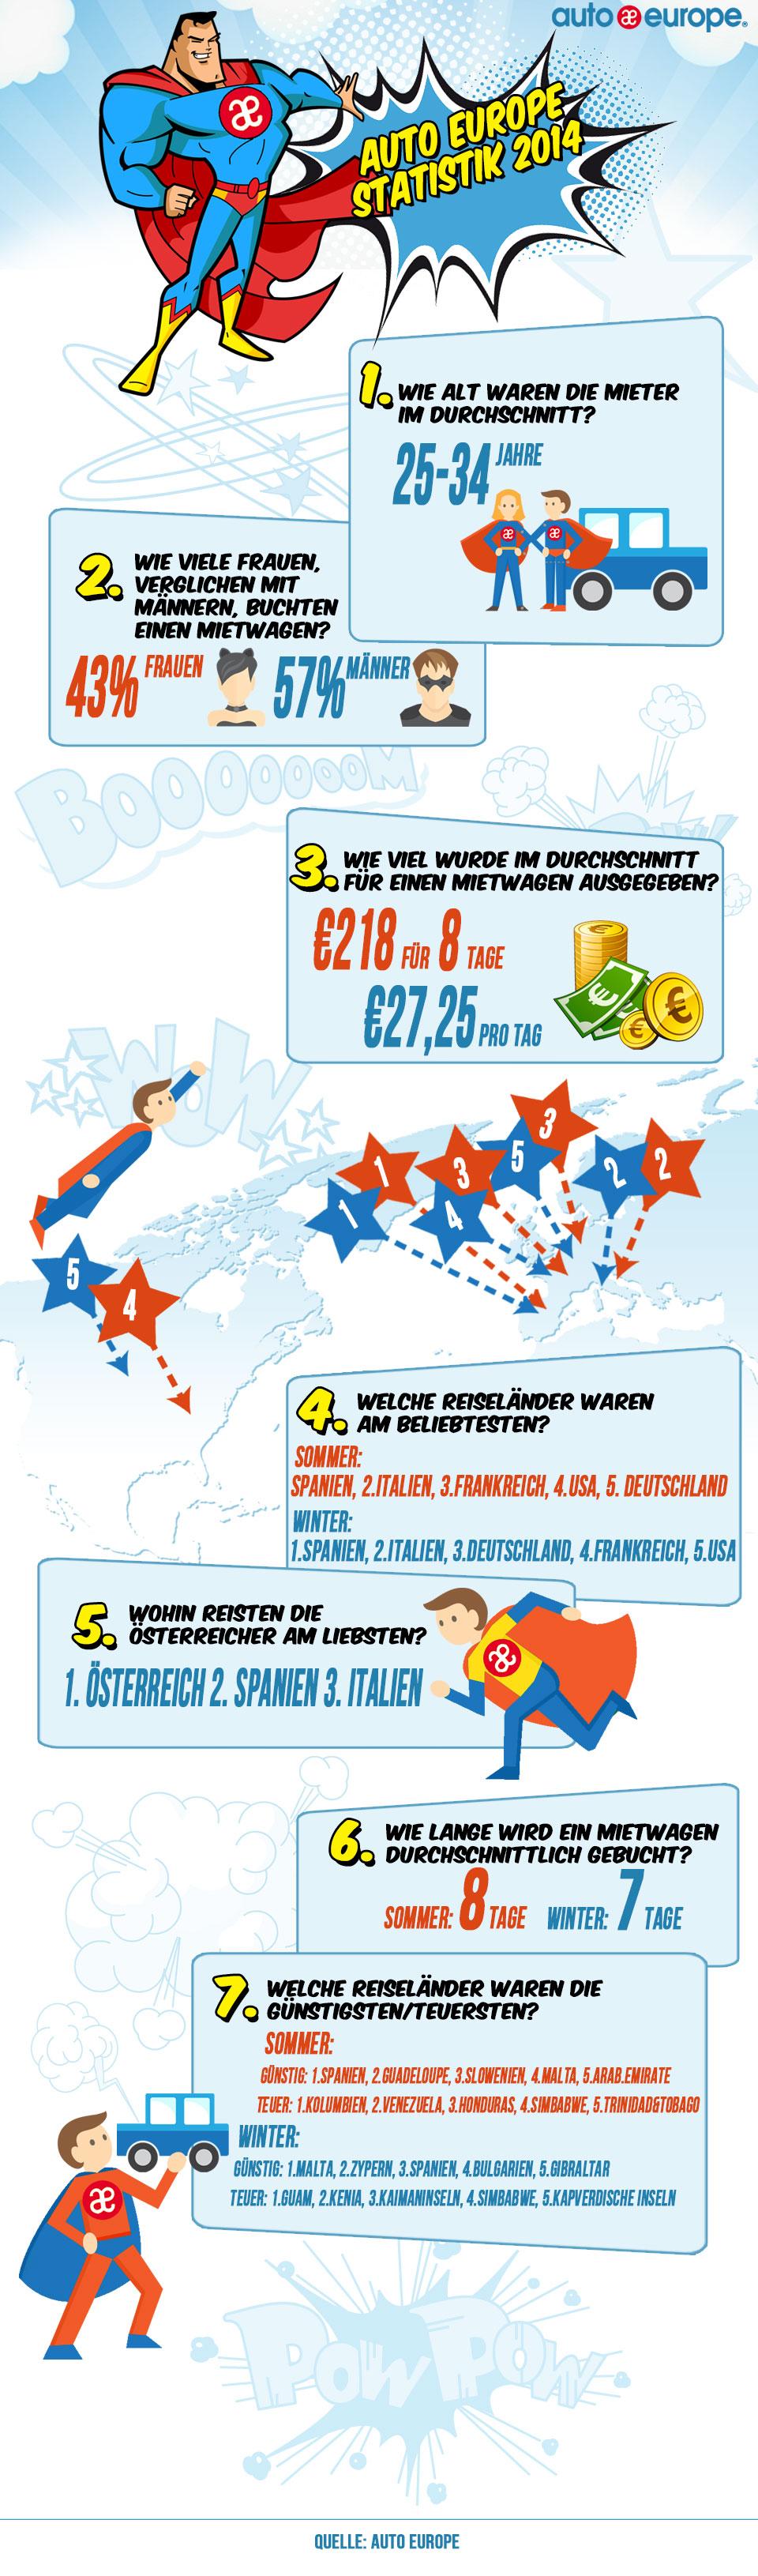 Auto Europe Statistiken